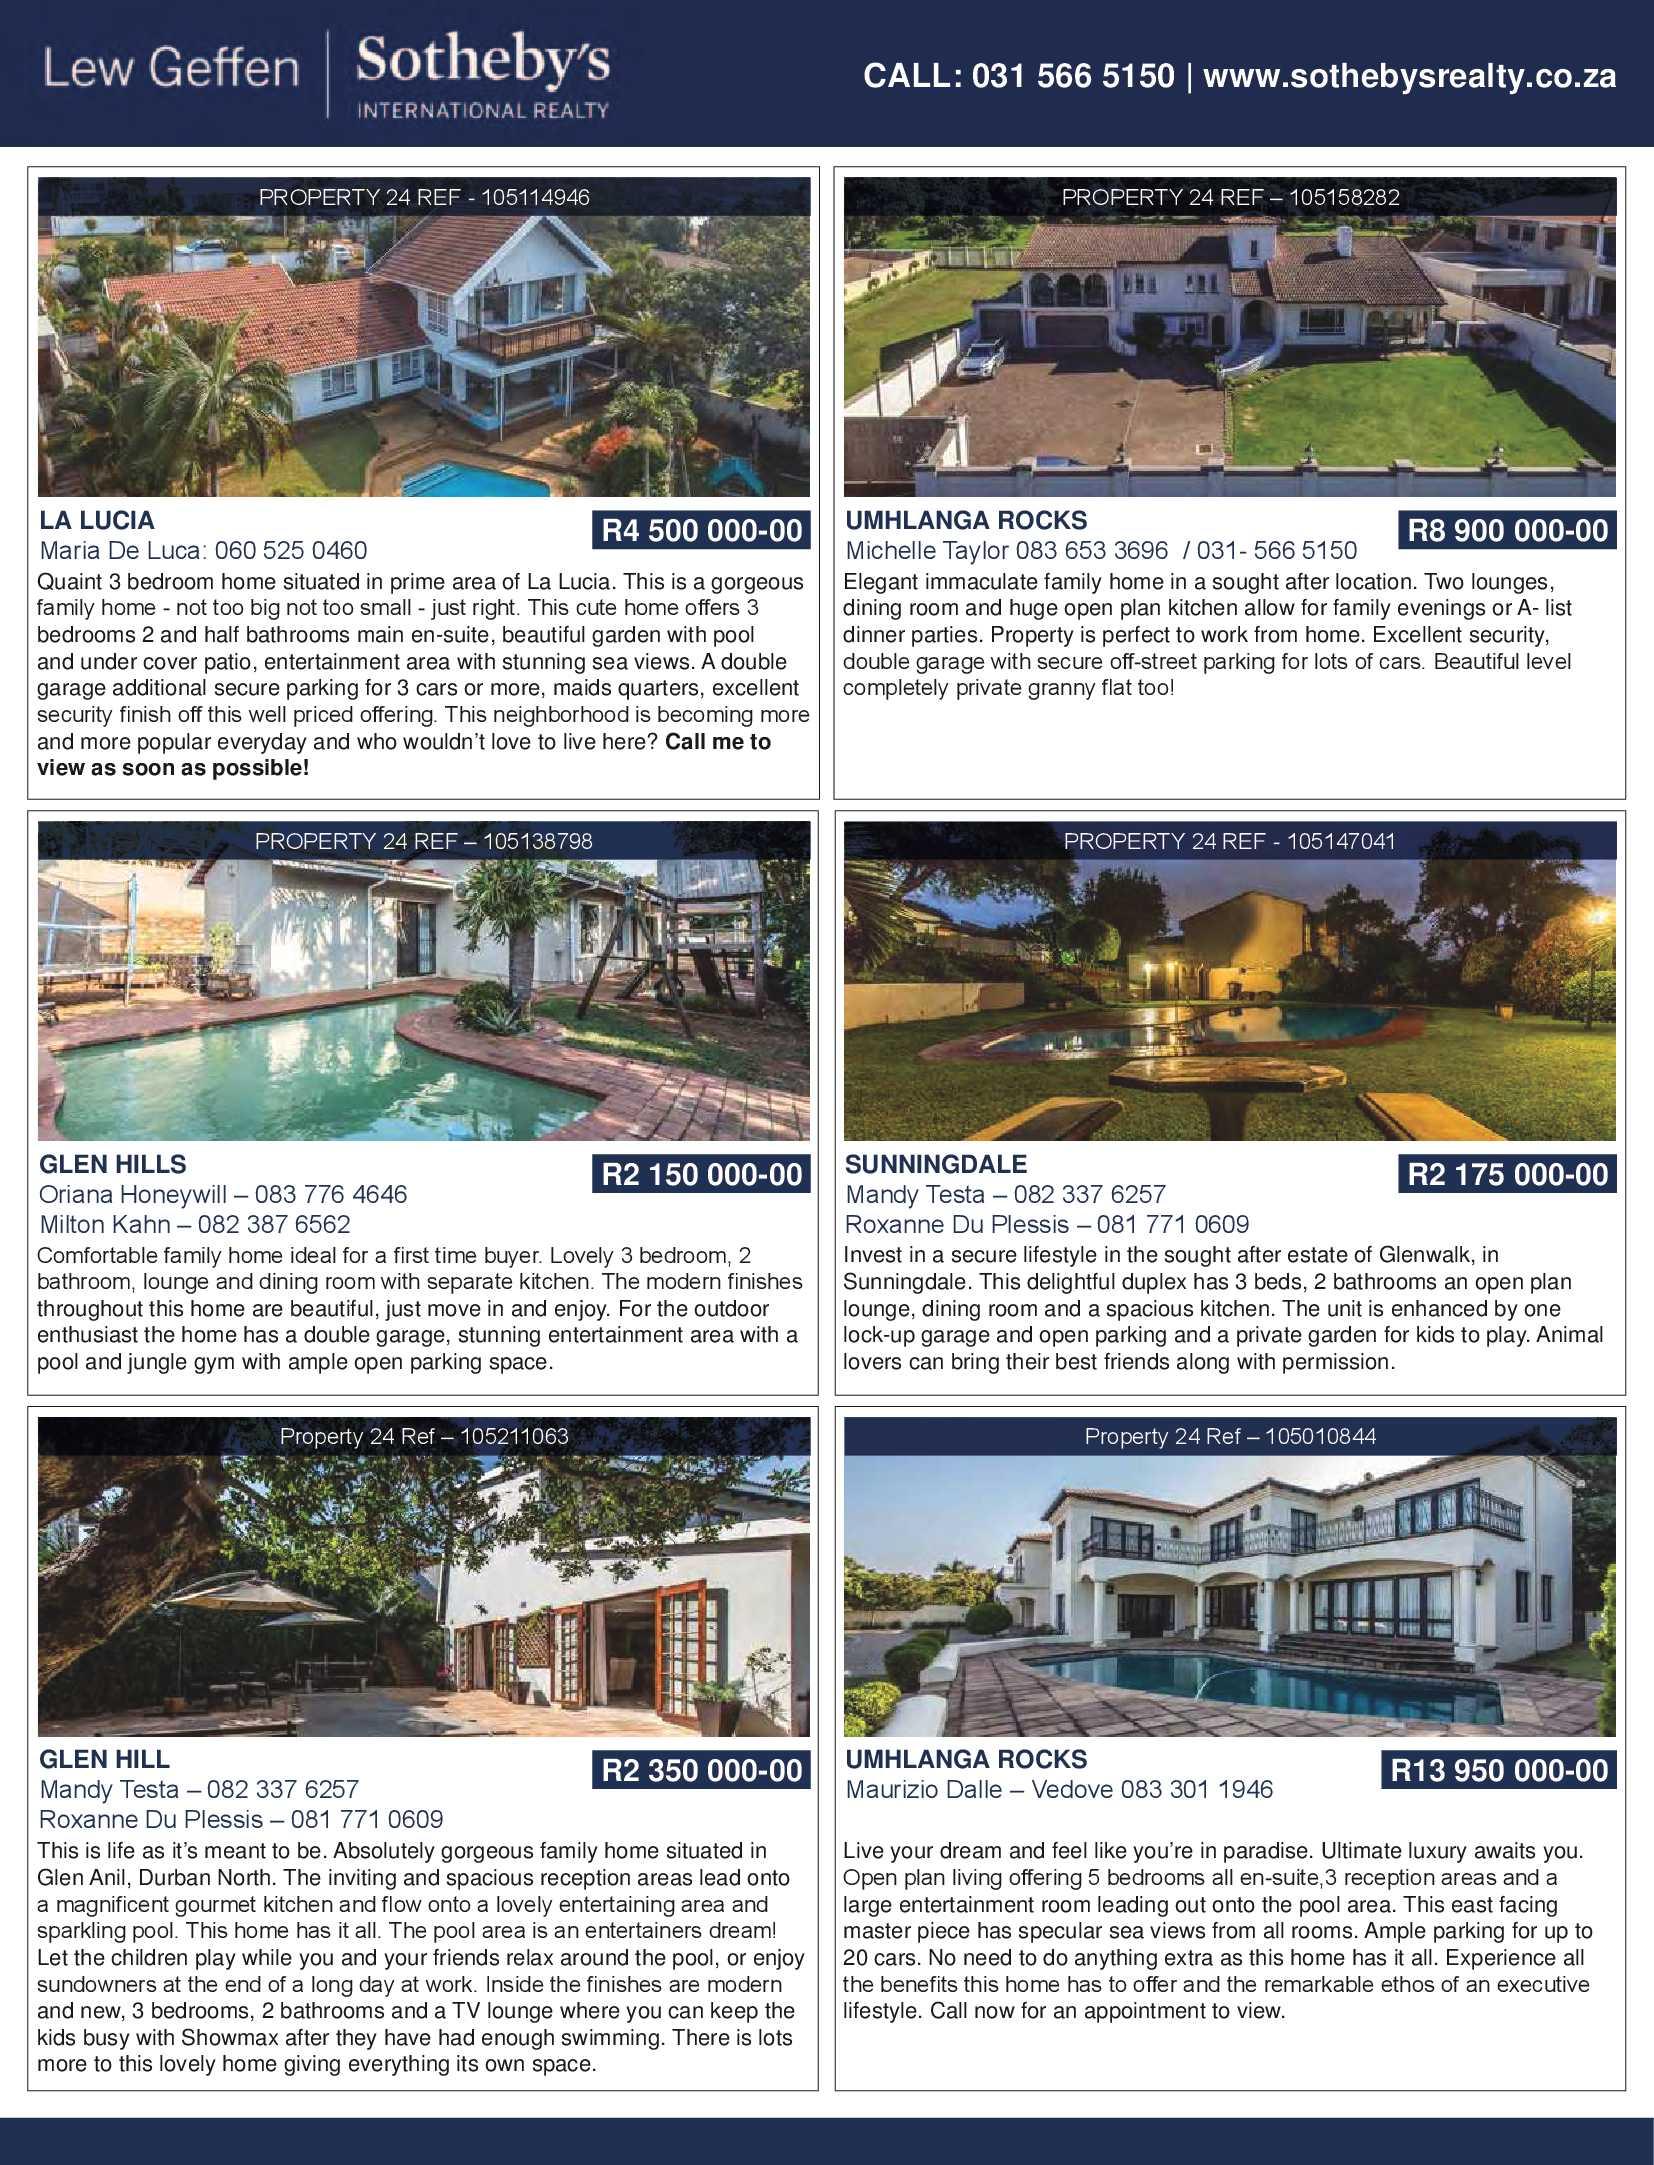 get-magazine-ballitoumhlanga-july-2017-2-epapers-page-46